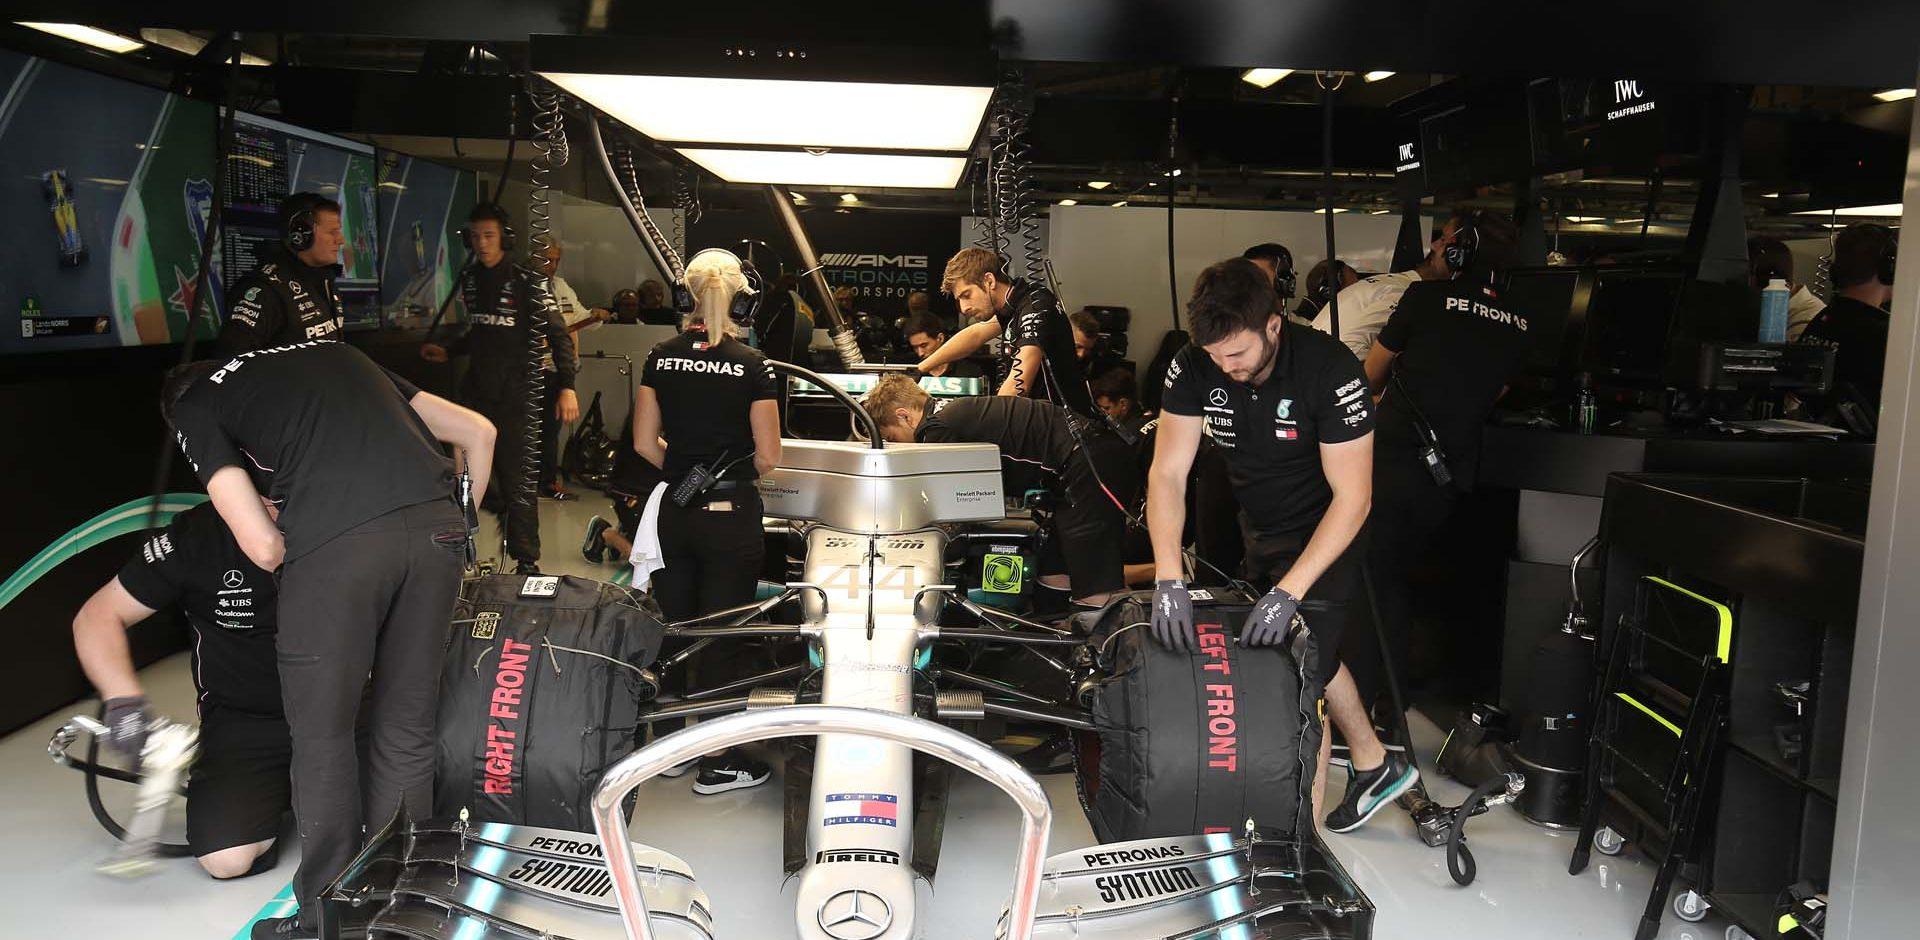 Italy, Italian Grand Prix 2019, Monza,  Lewis Hamilton Mercedes garage